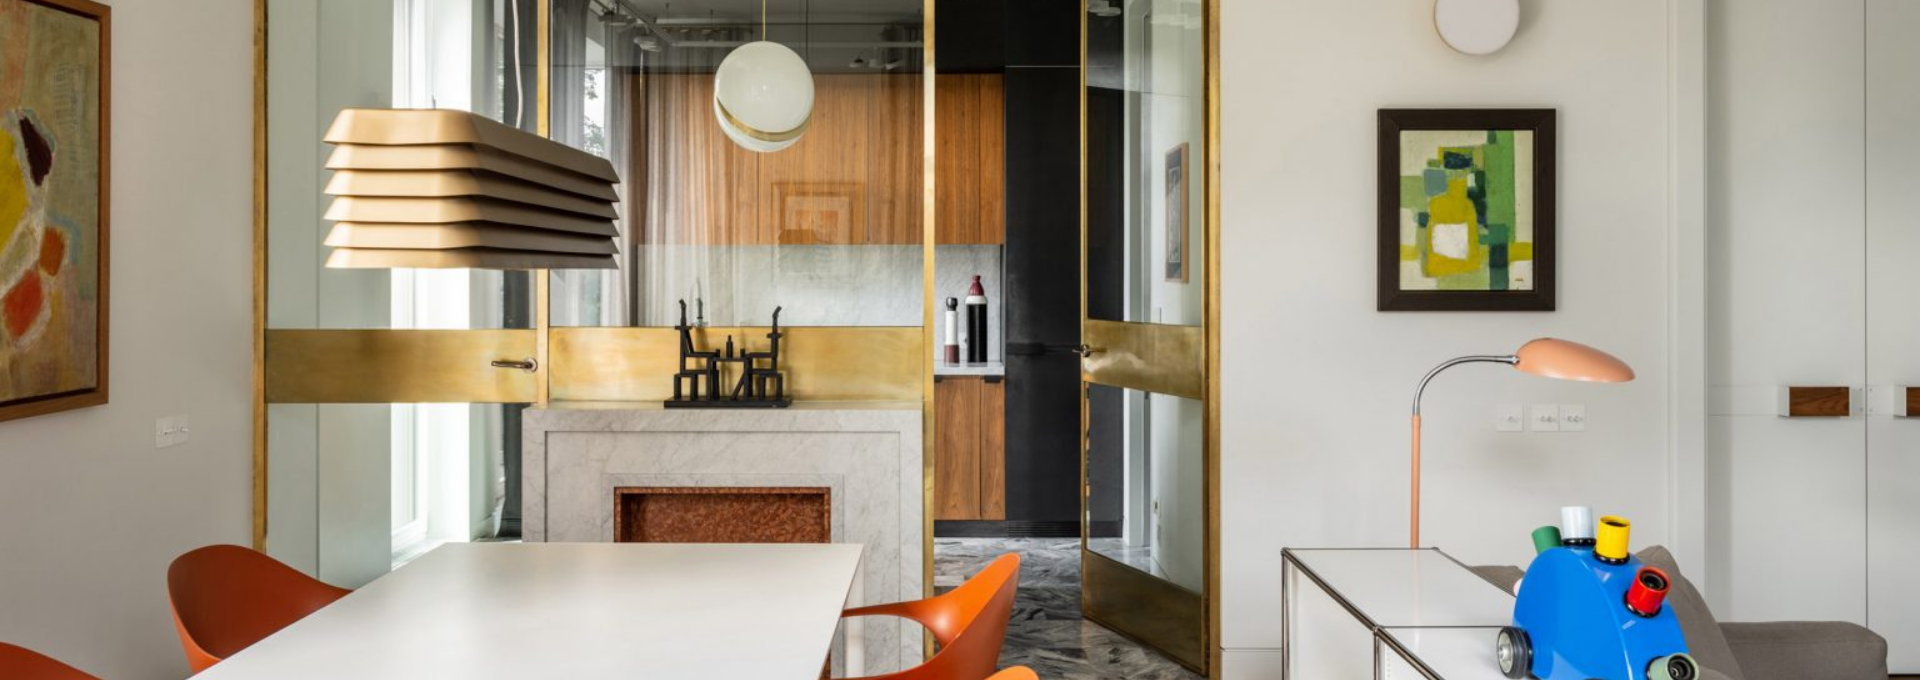 Blockstudio creates Parisian ambience in Moscow apartment